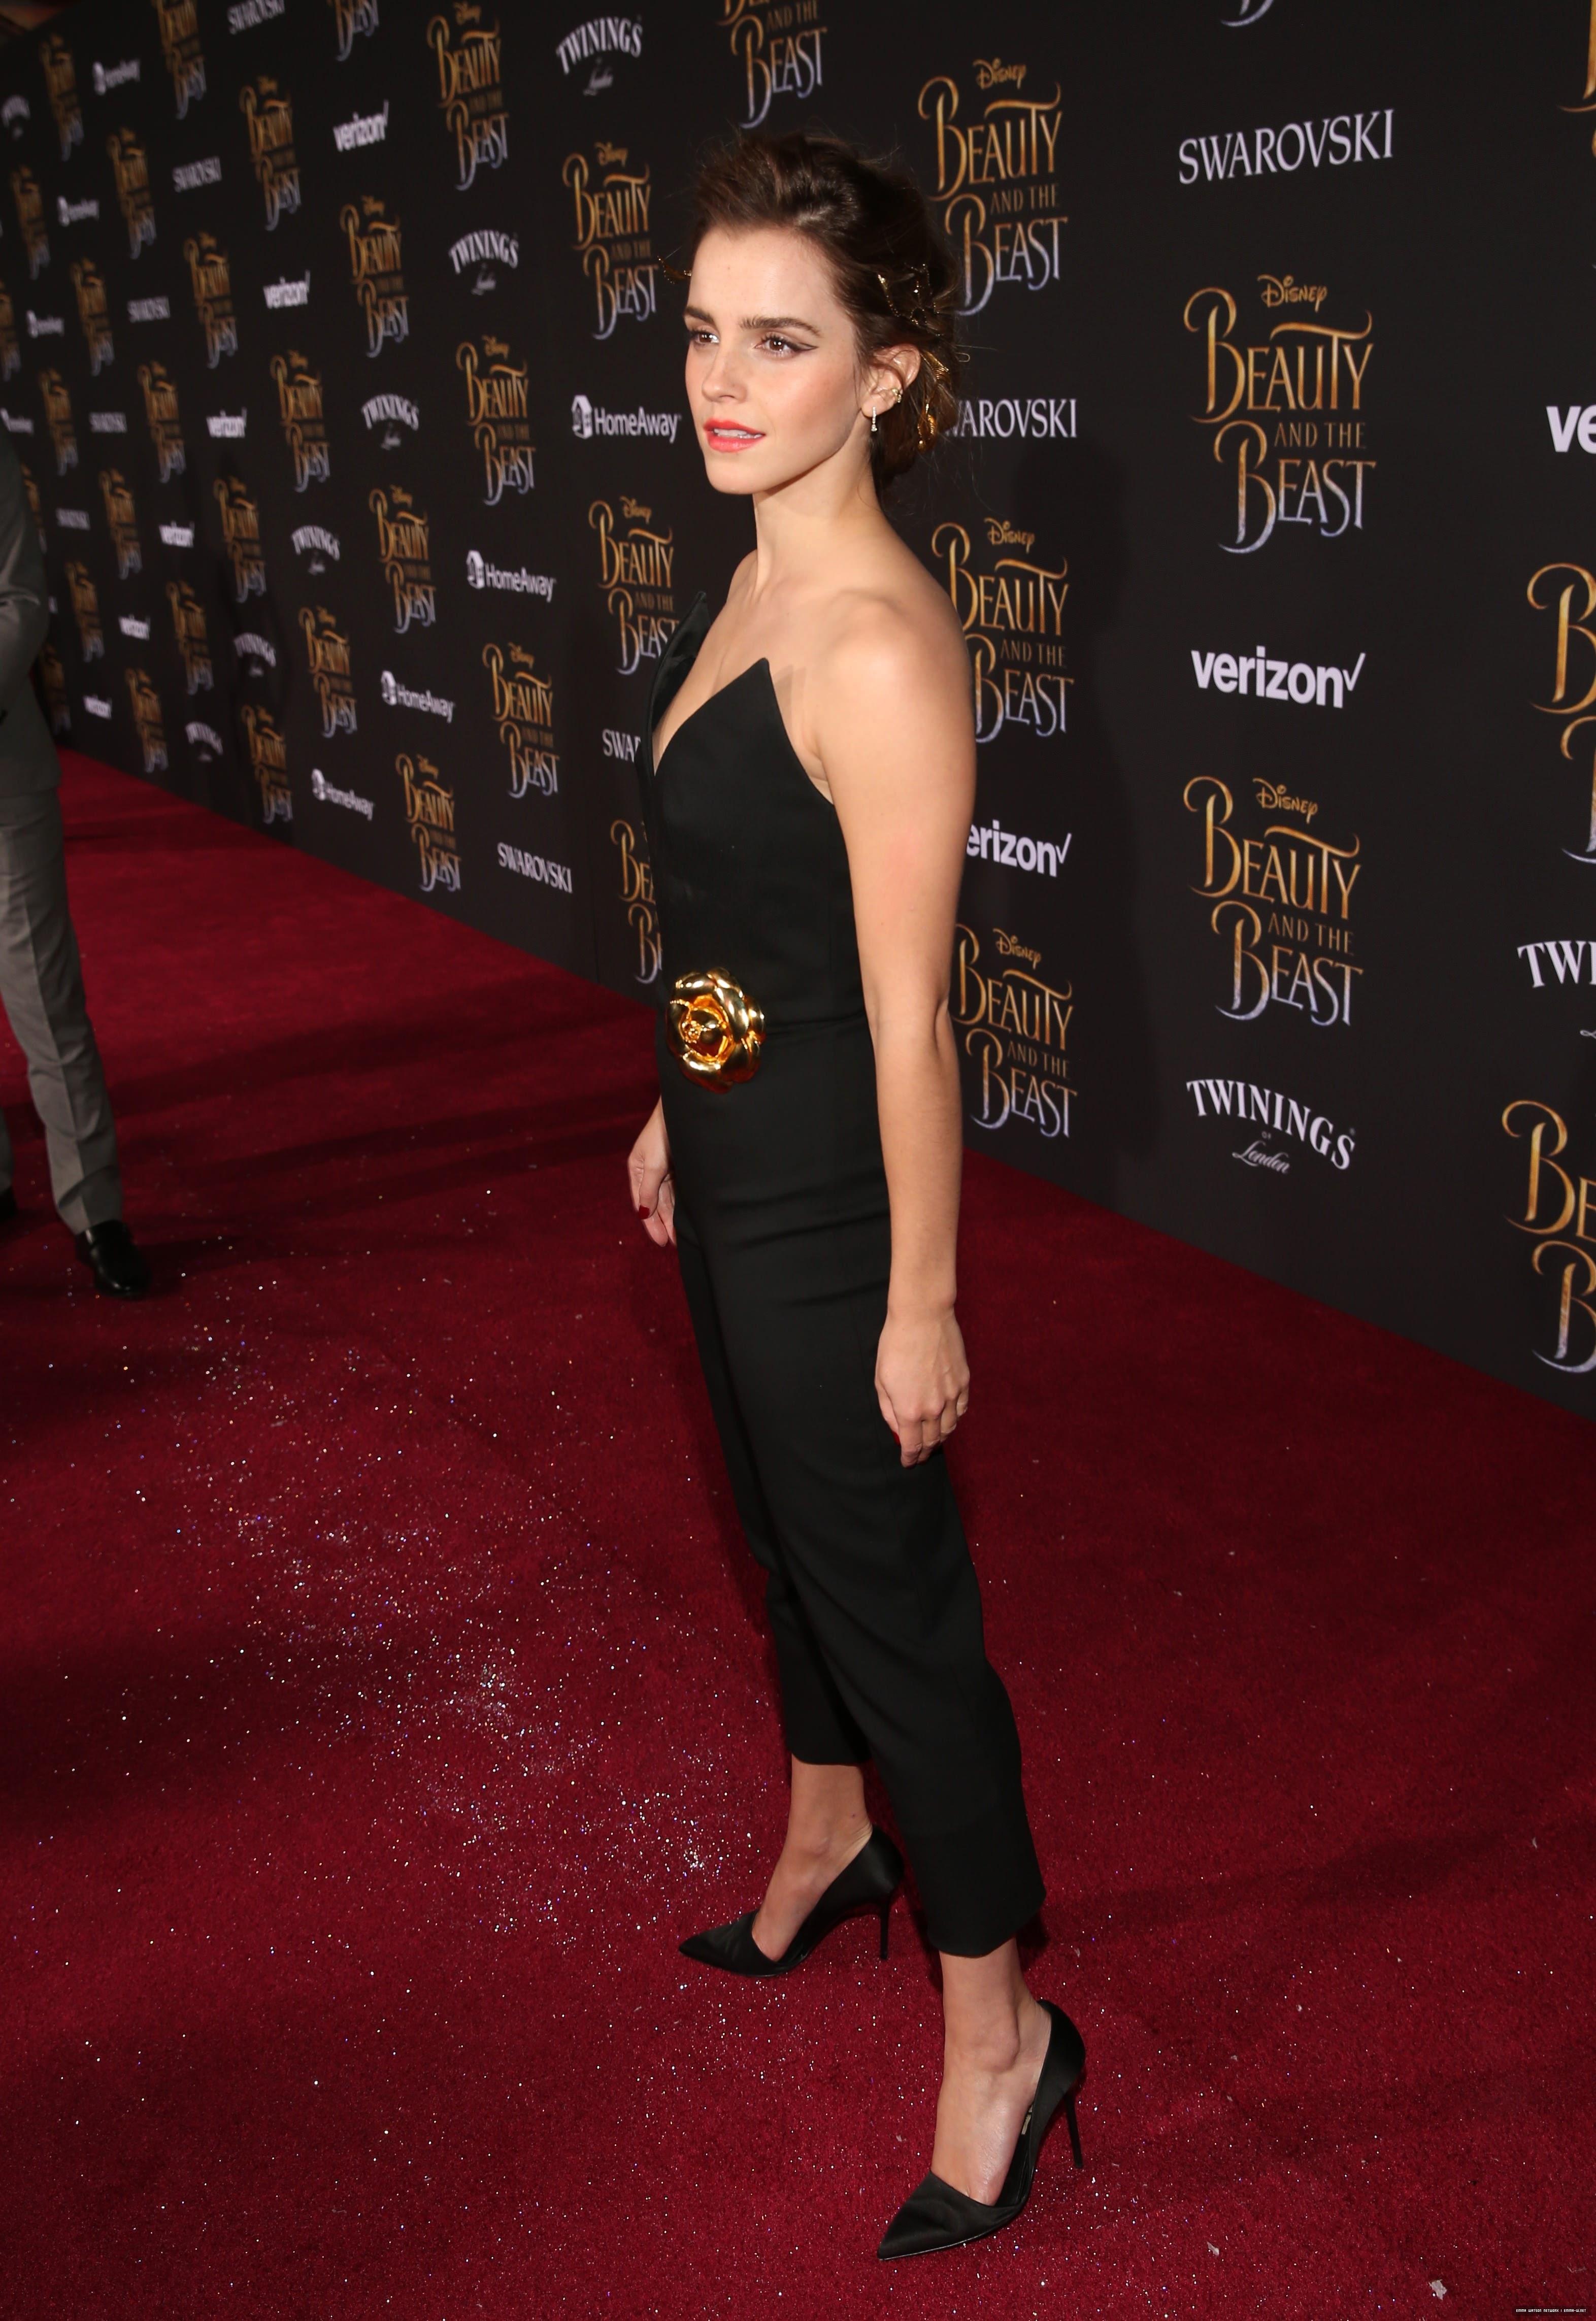 Beauty and the Beast actress Emma Watson